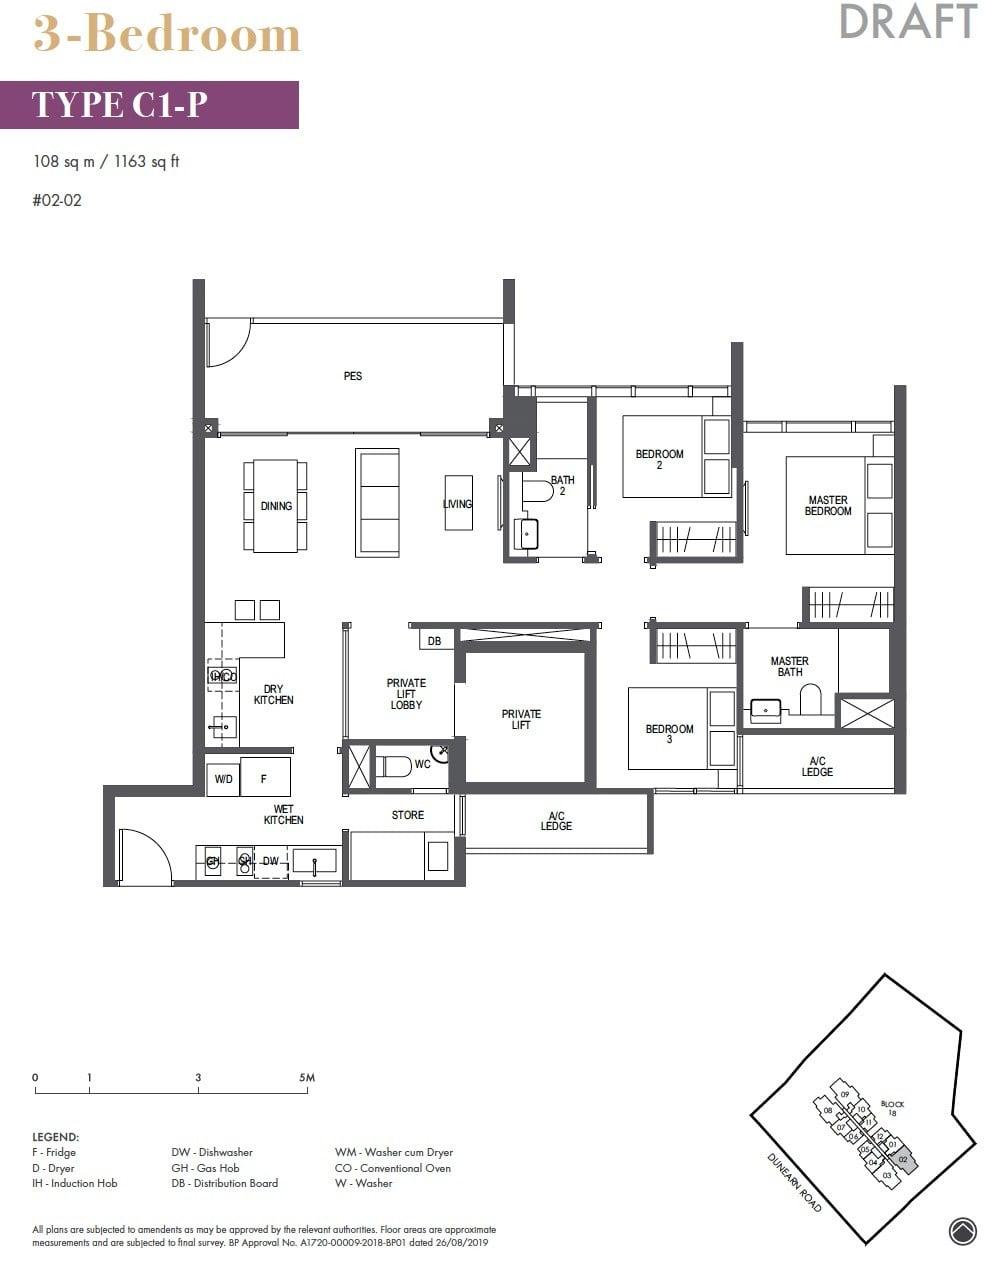 Pullman-Residences-Newton-3BR 1163sf